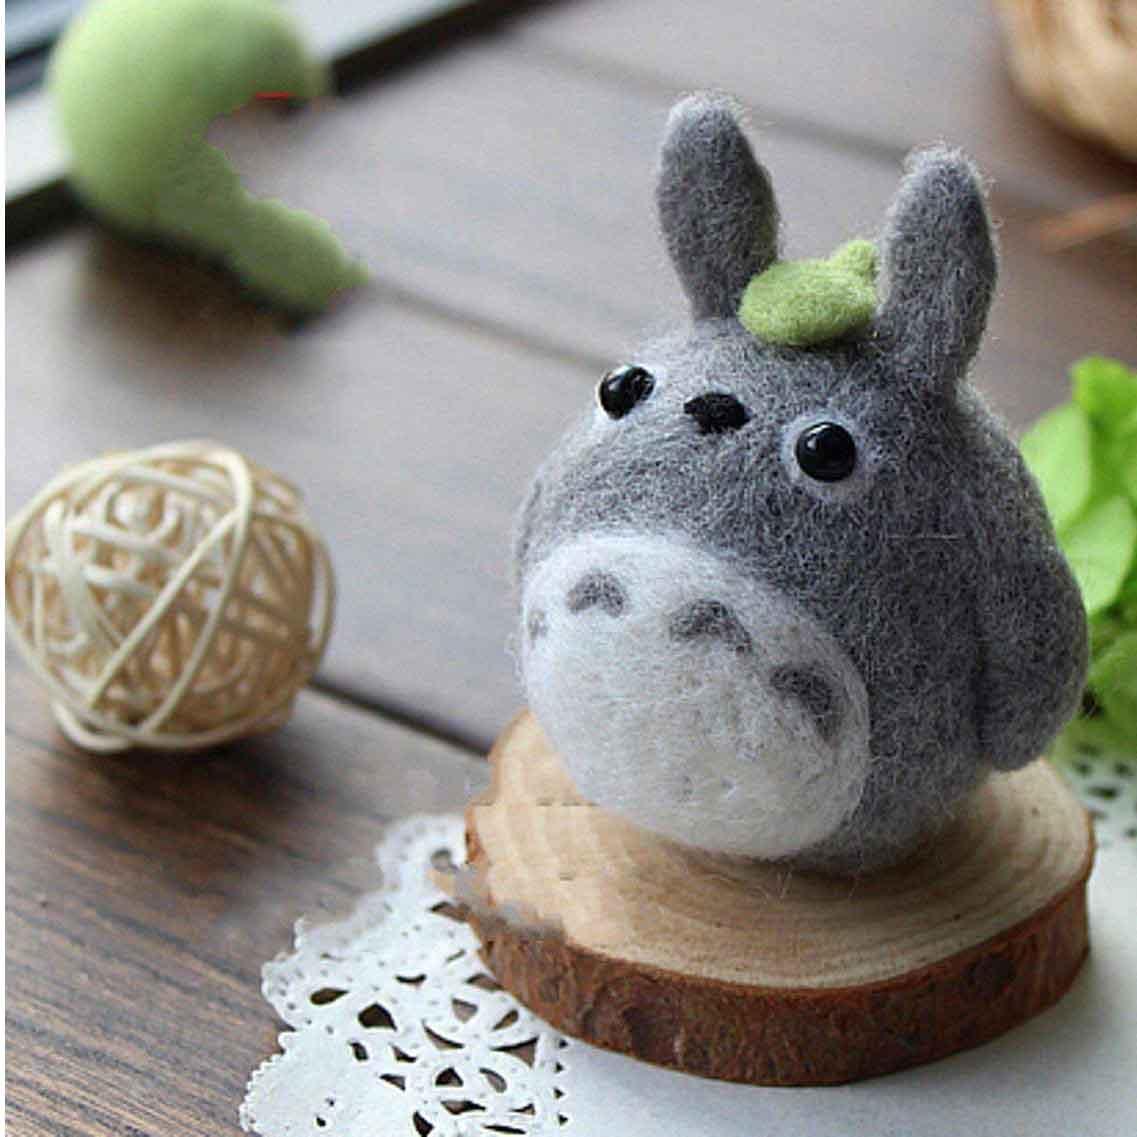 Totoro Needle Felting Kits Felt Totoro Giant Stitch